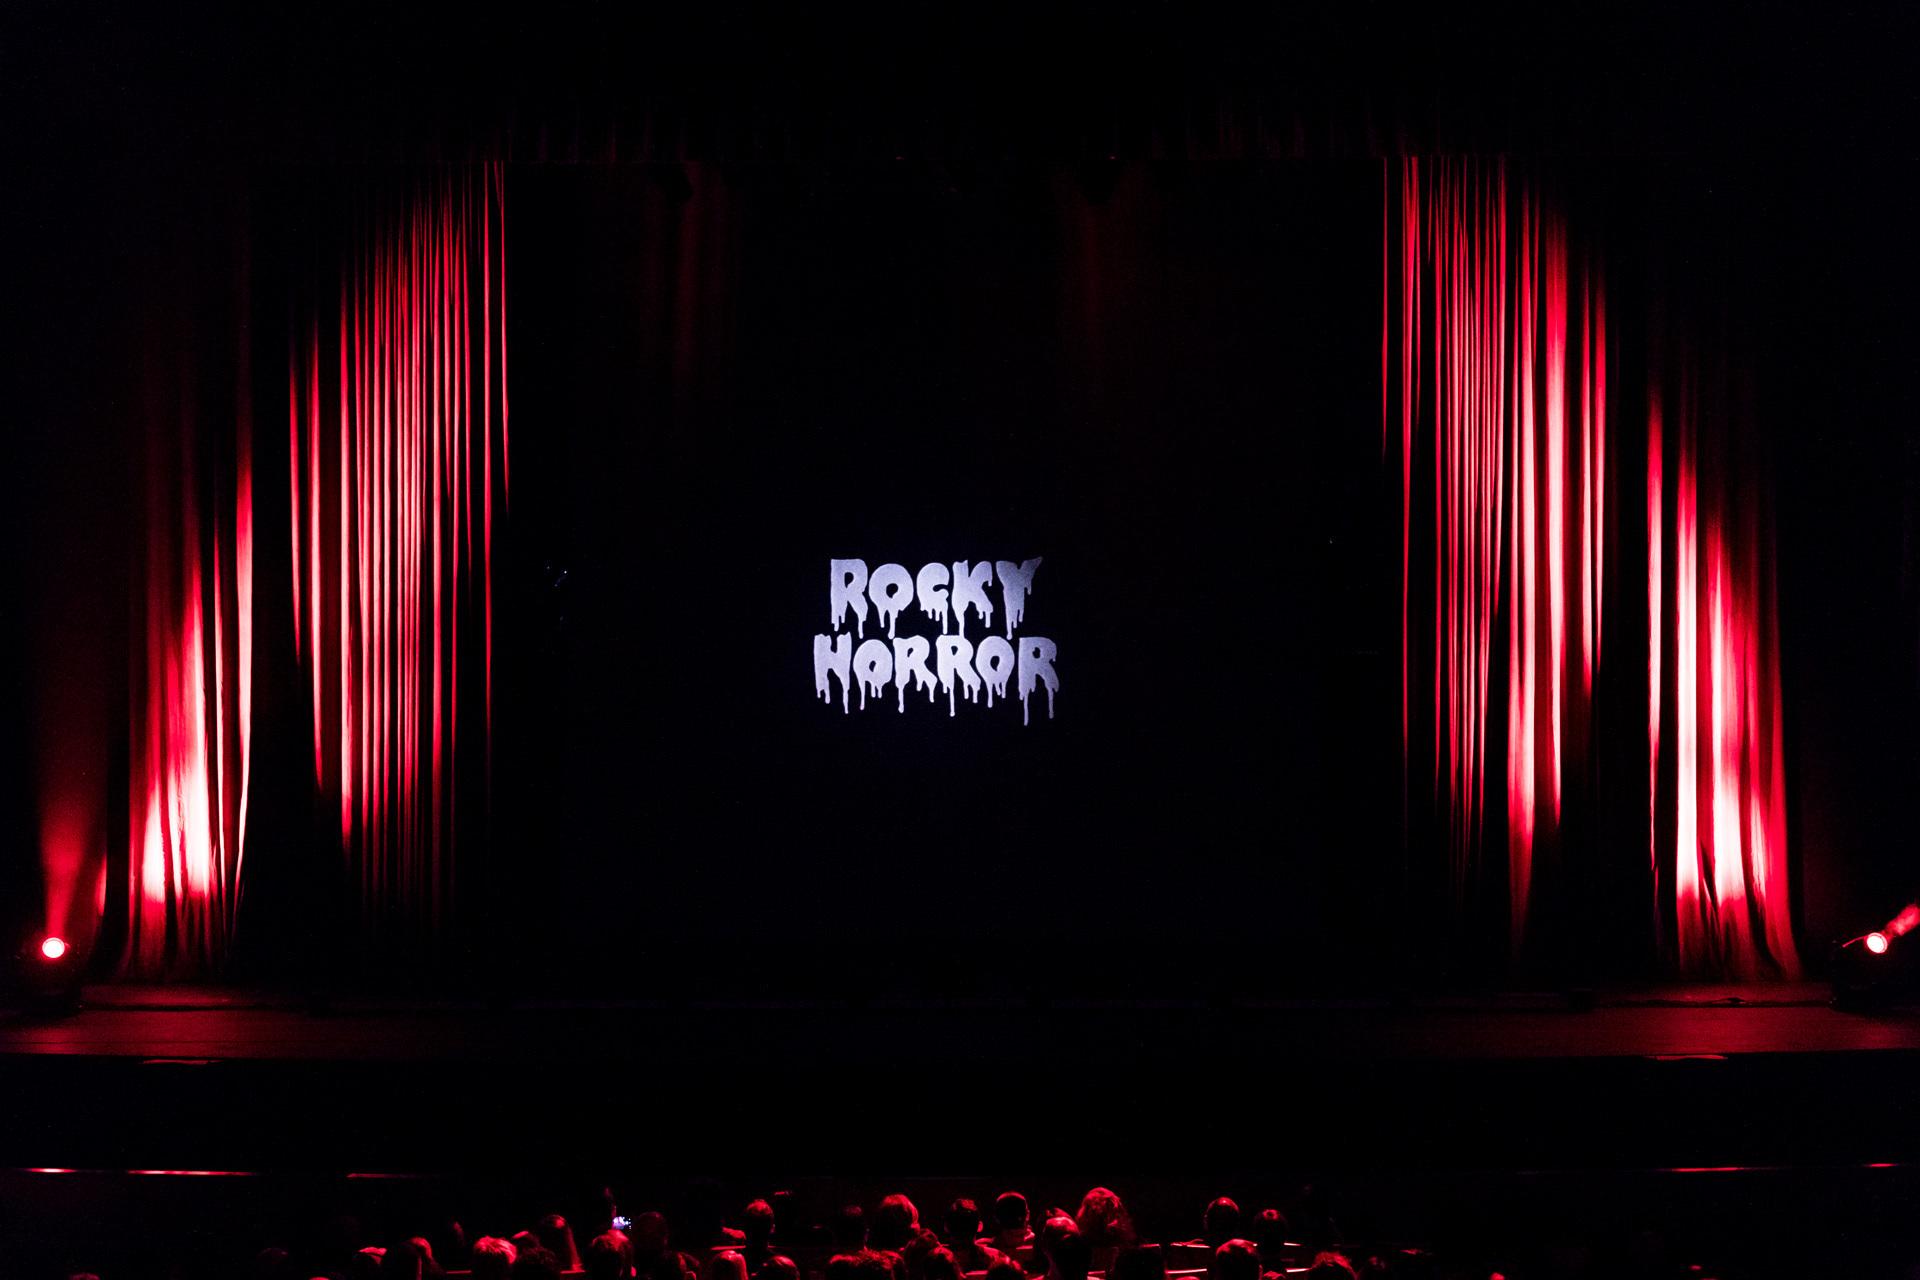 2017_10_25_©LKV_Rocky_Horror_Show_211217_5D4B1155